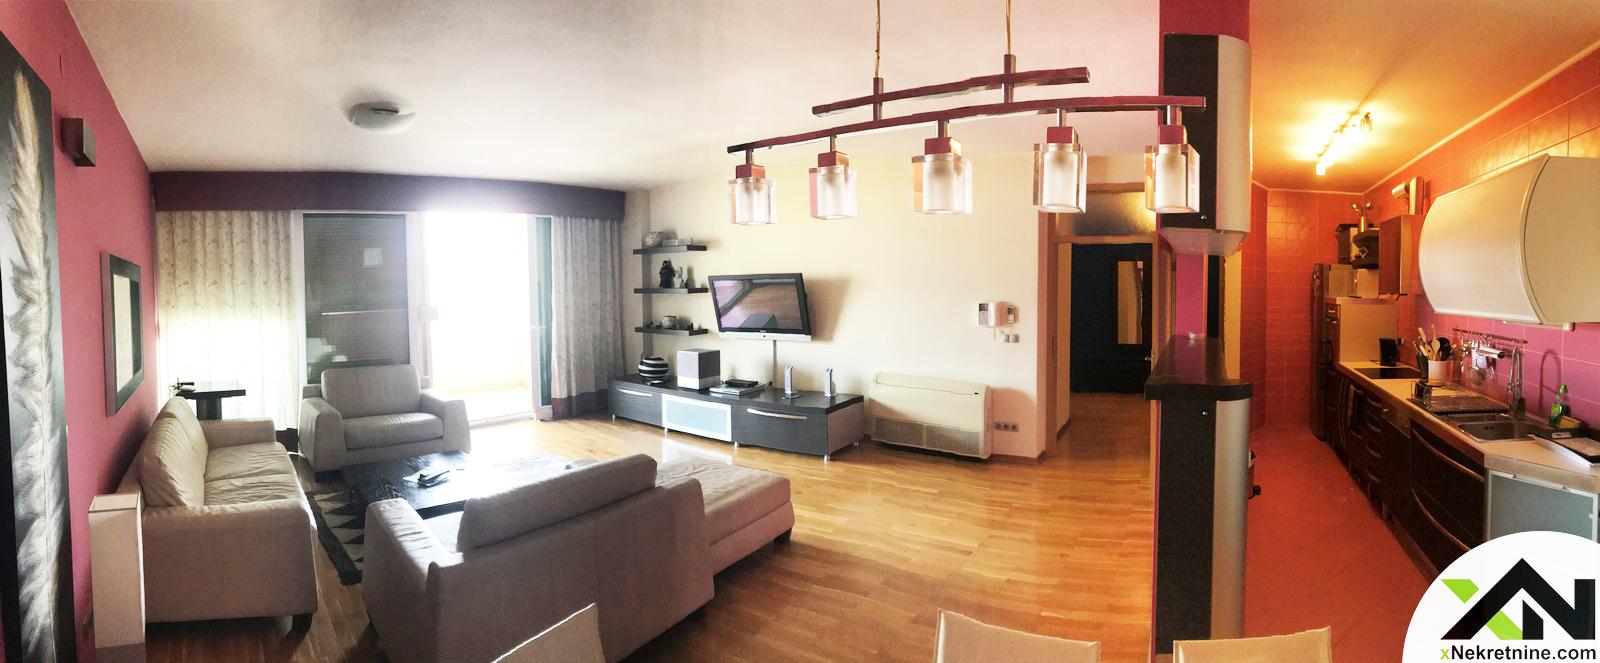 Luksuzan stan za najam – Rondo